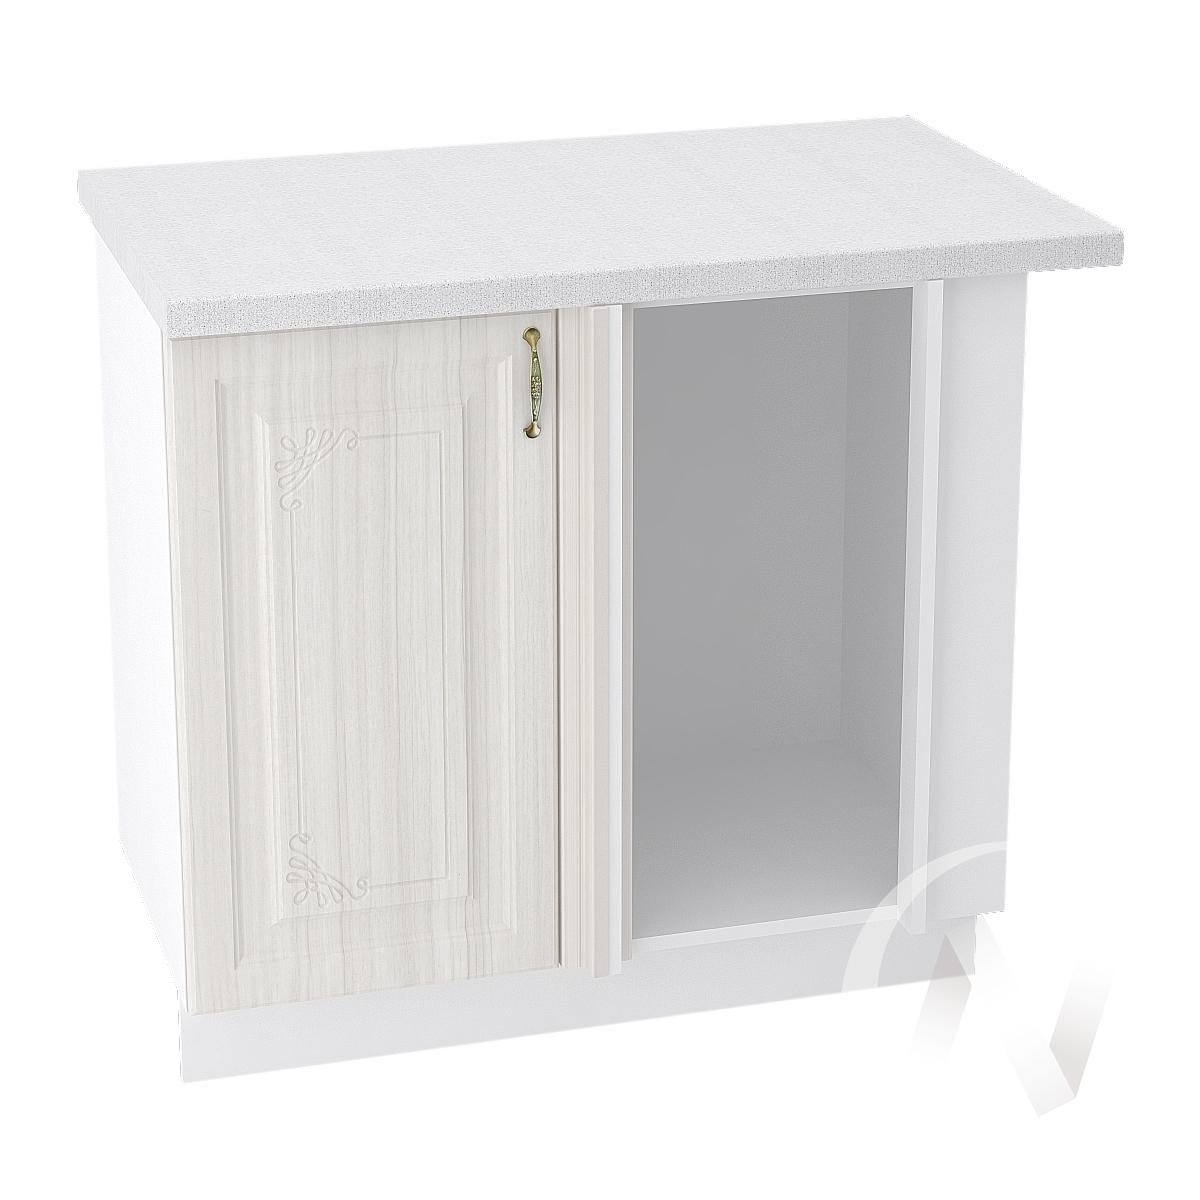 "Кухня ""Виктория"": Шкаф нижний угловой 990М, ШНУ 990М (корпус белый)"